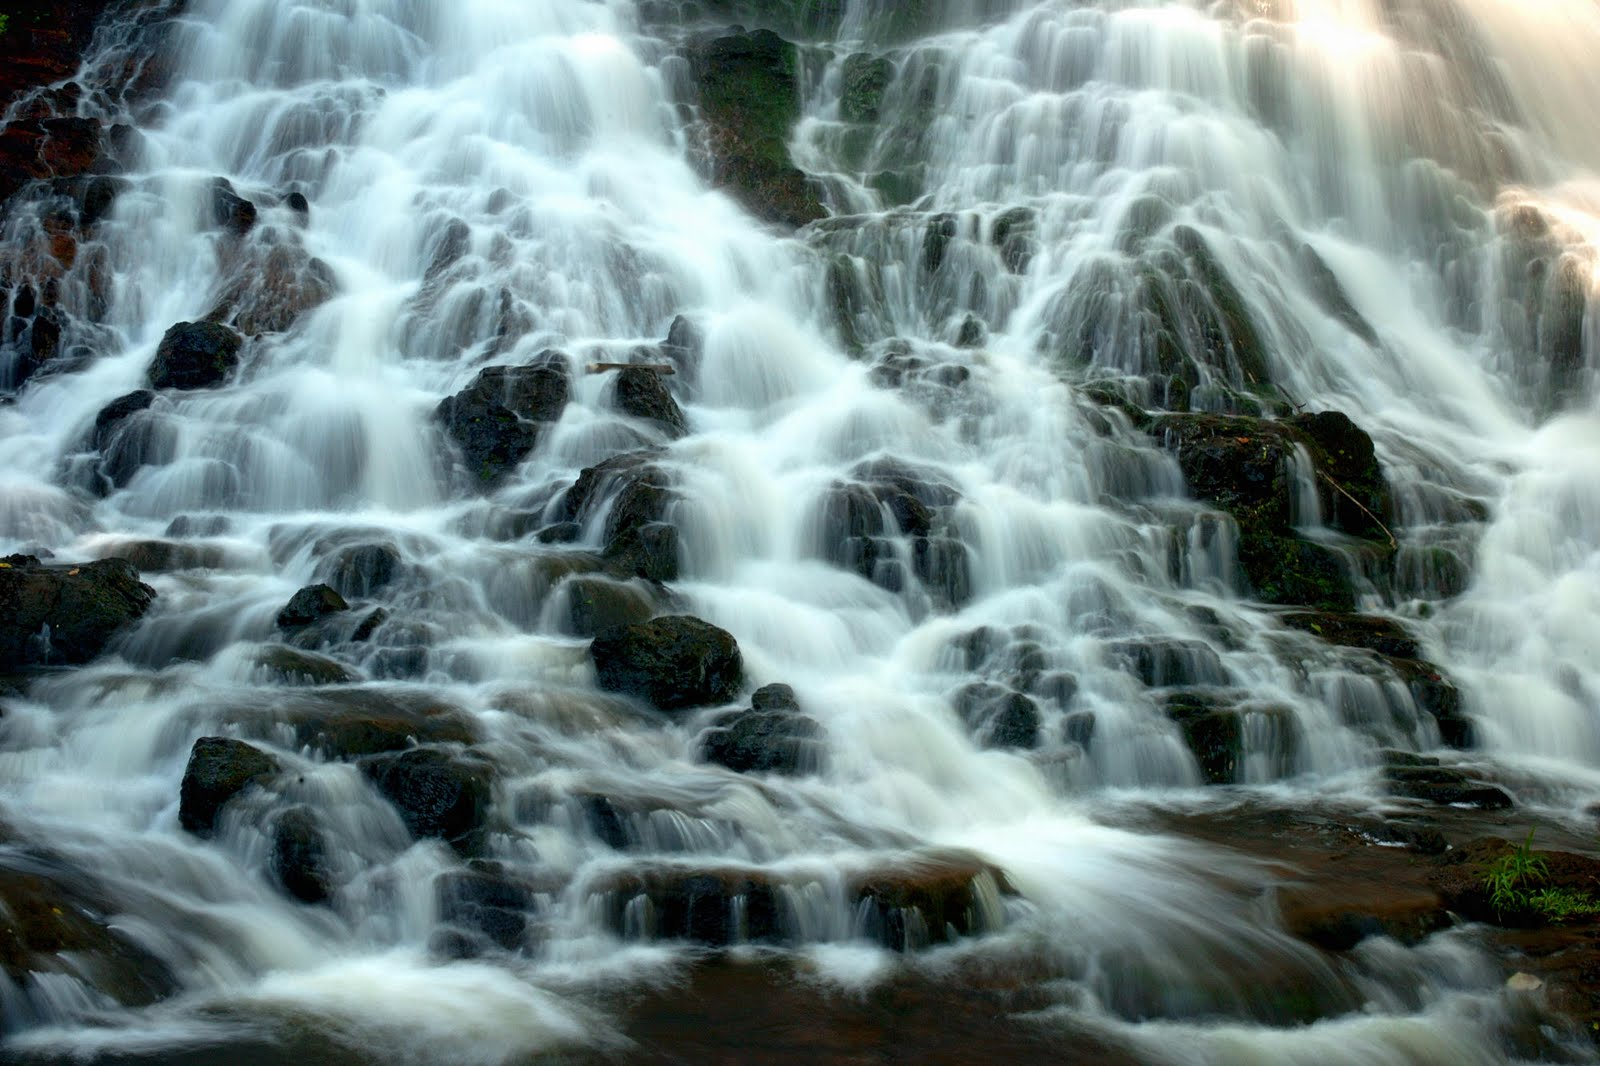 http://3.bp.blogspot.com/-Ymt2YJbDfos/Th5oqsQqrnI/AAAAAAAAAMc/bqfZaxws4dg/s1600/Secluded+Falls%252C+Kauai%252C+Hawaii.jpg